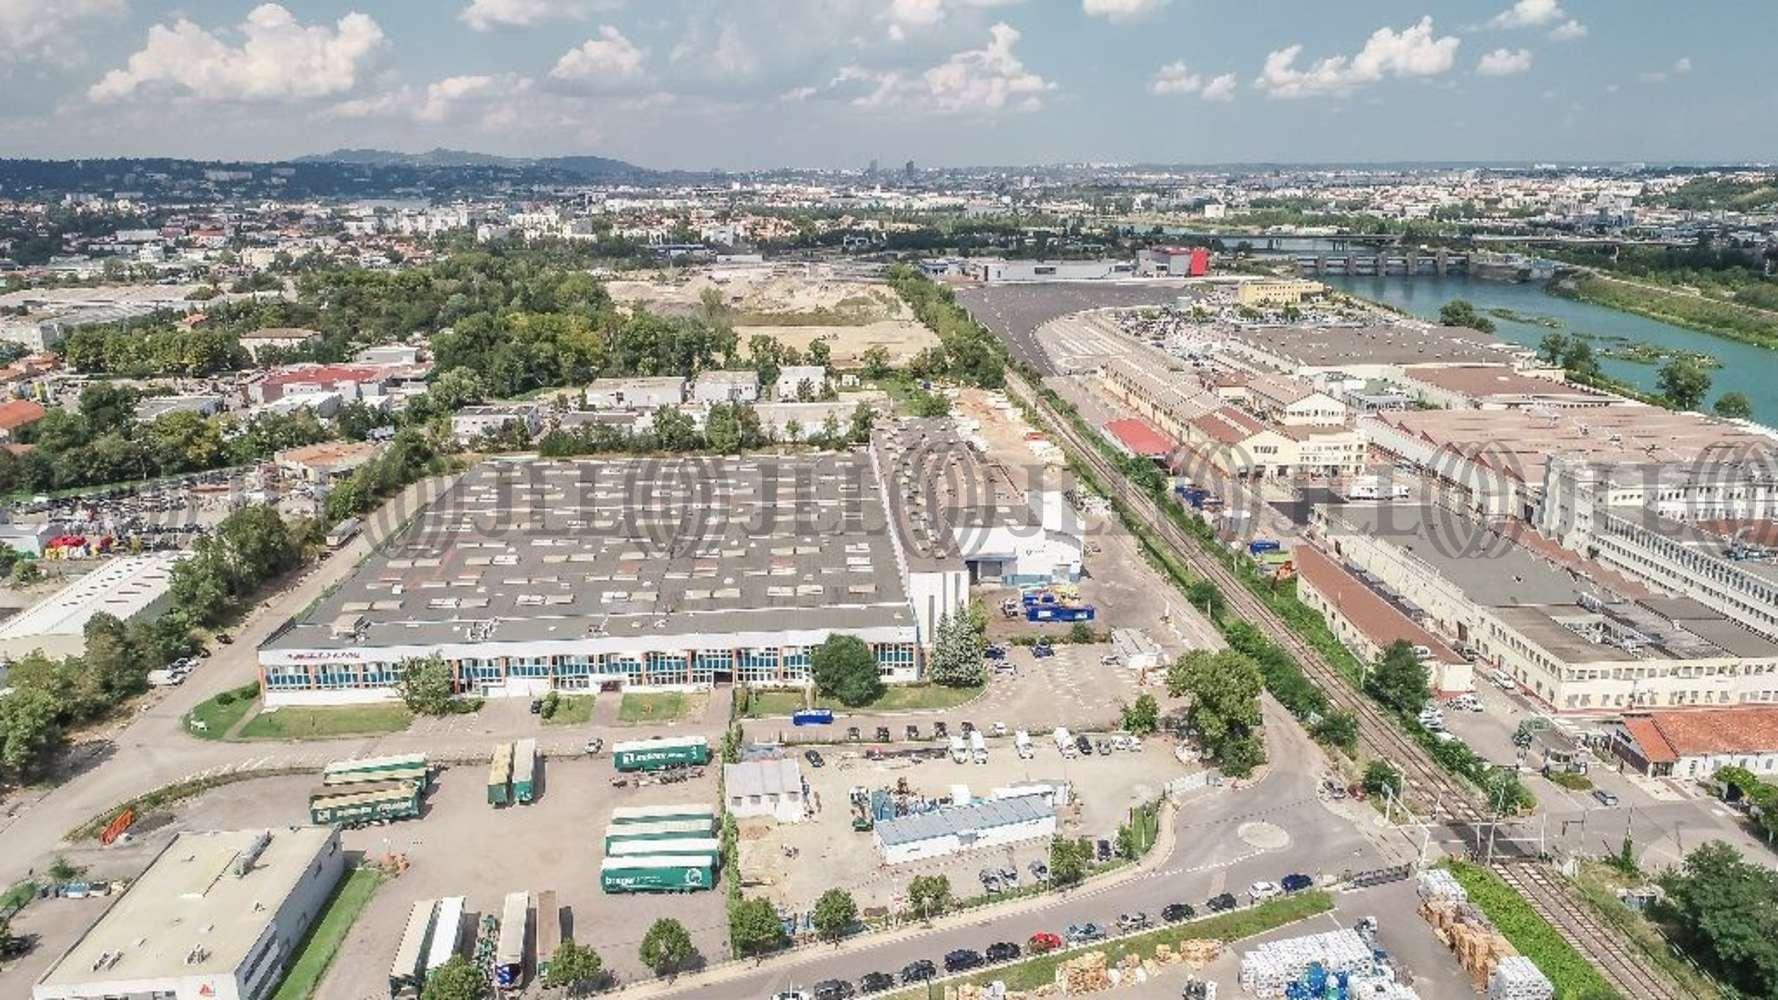 Plateformes logistiques Irigny, 69540 - Entrepot à vendre Lyon Sud - Irigny - 9983578